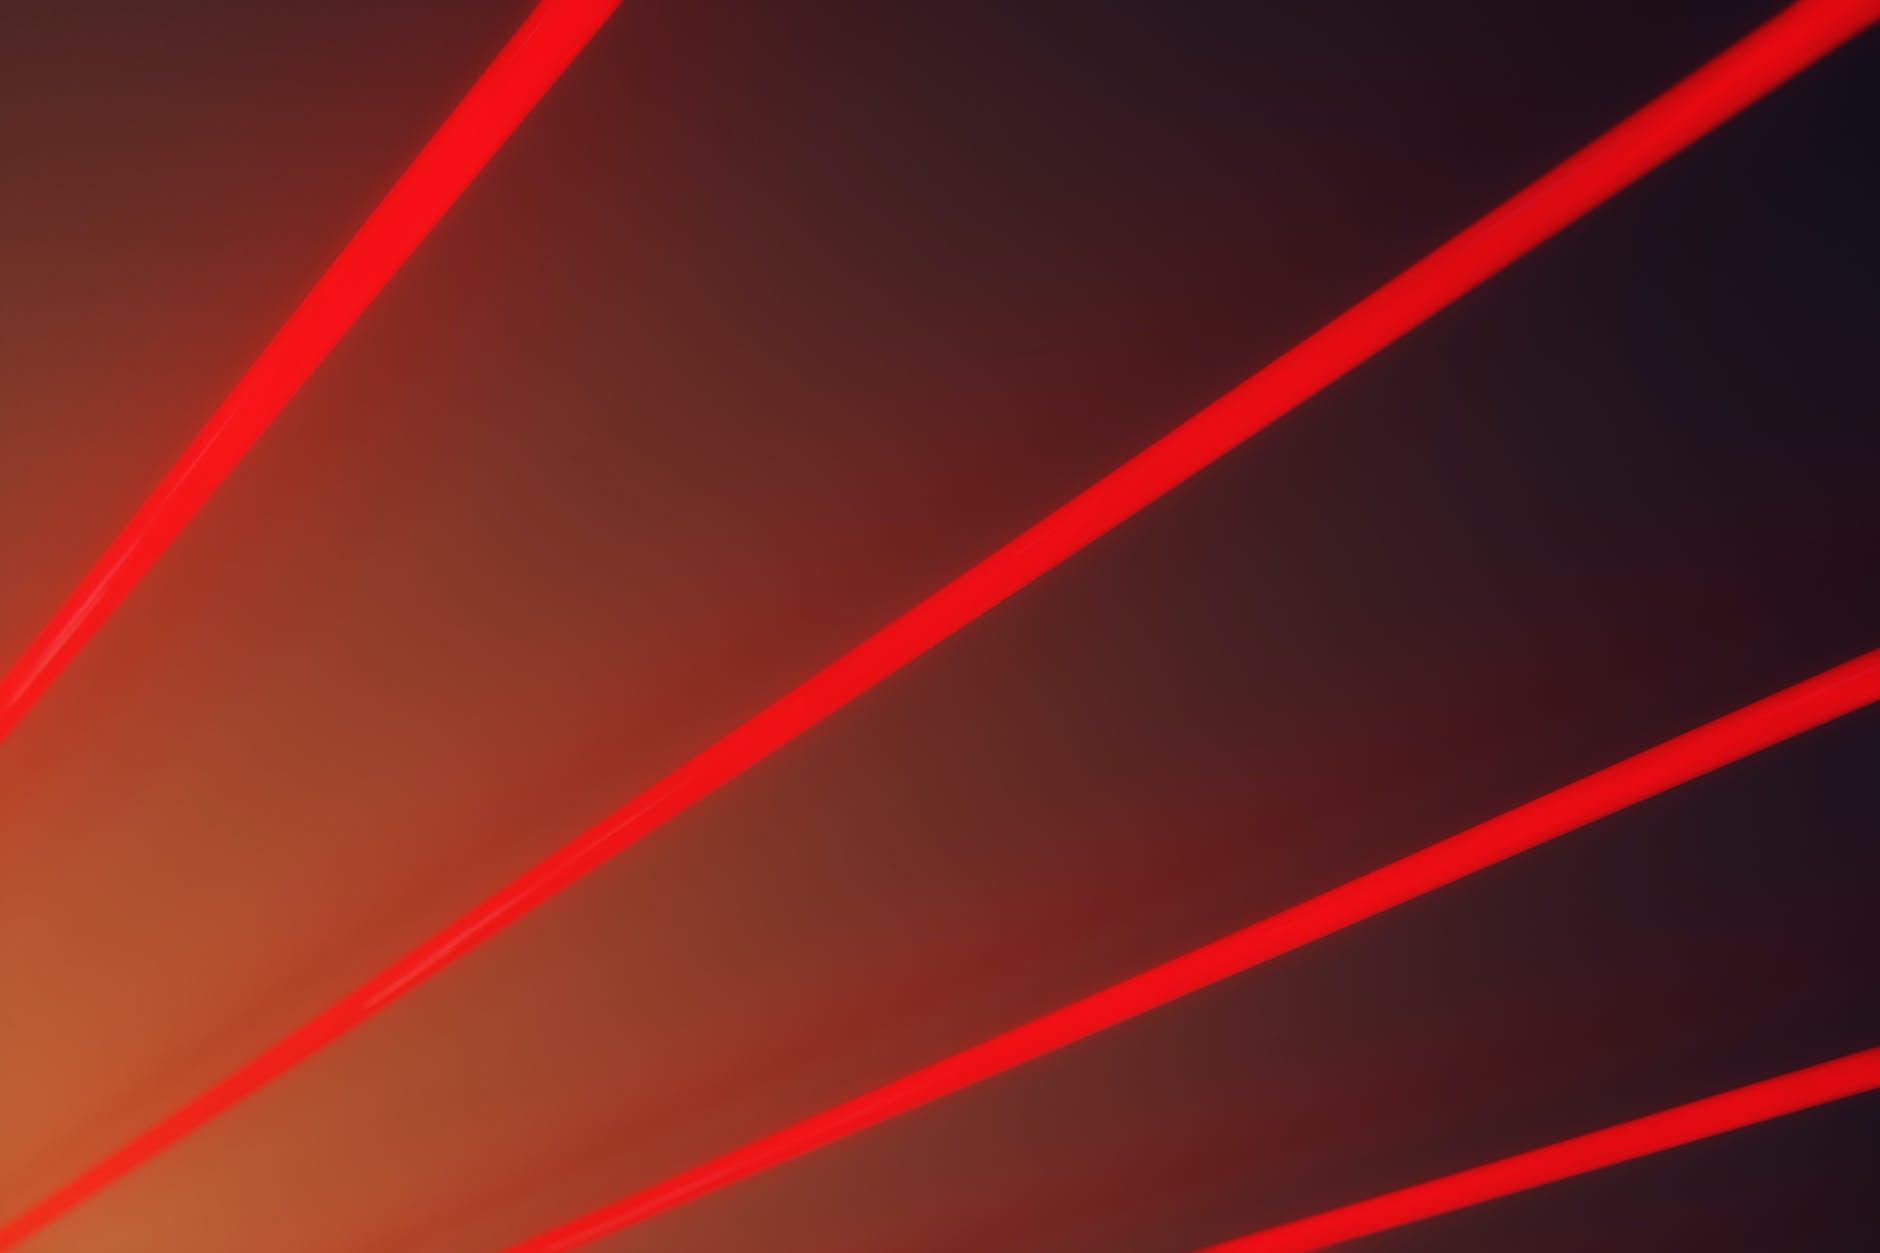 red light beams